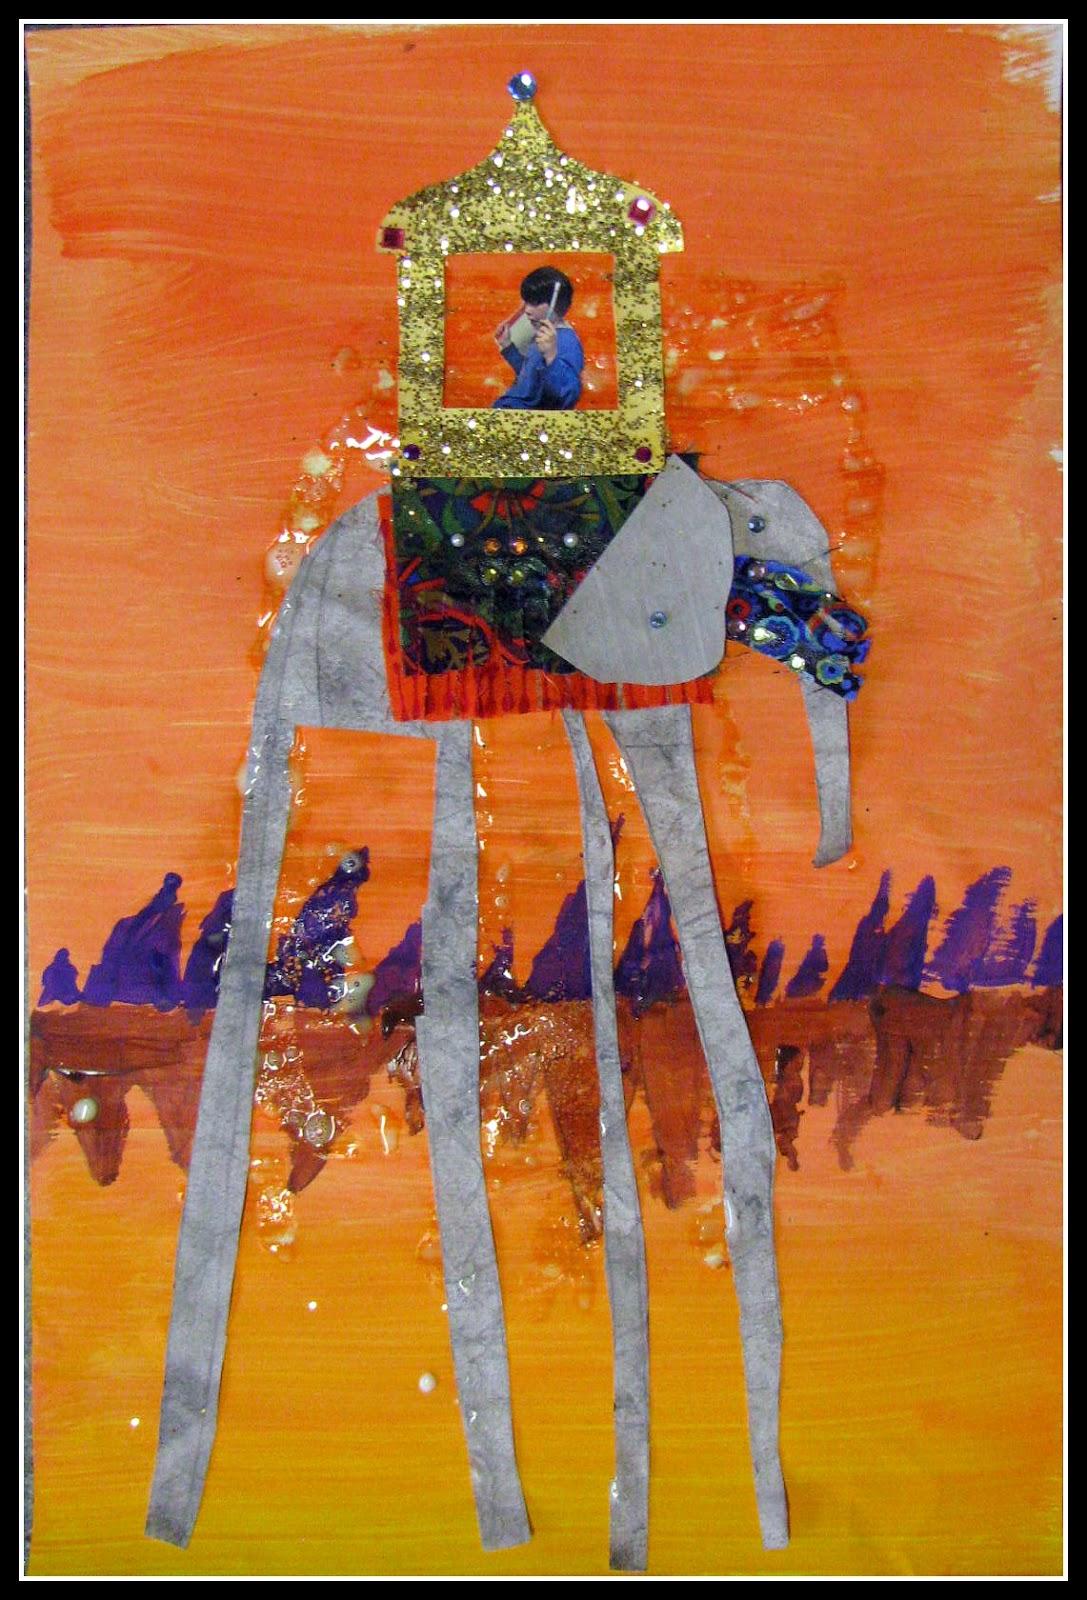 Plateau Art Studio Dali S Surreal Elephants